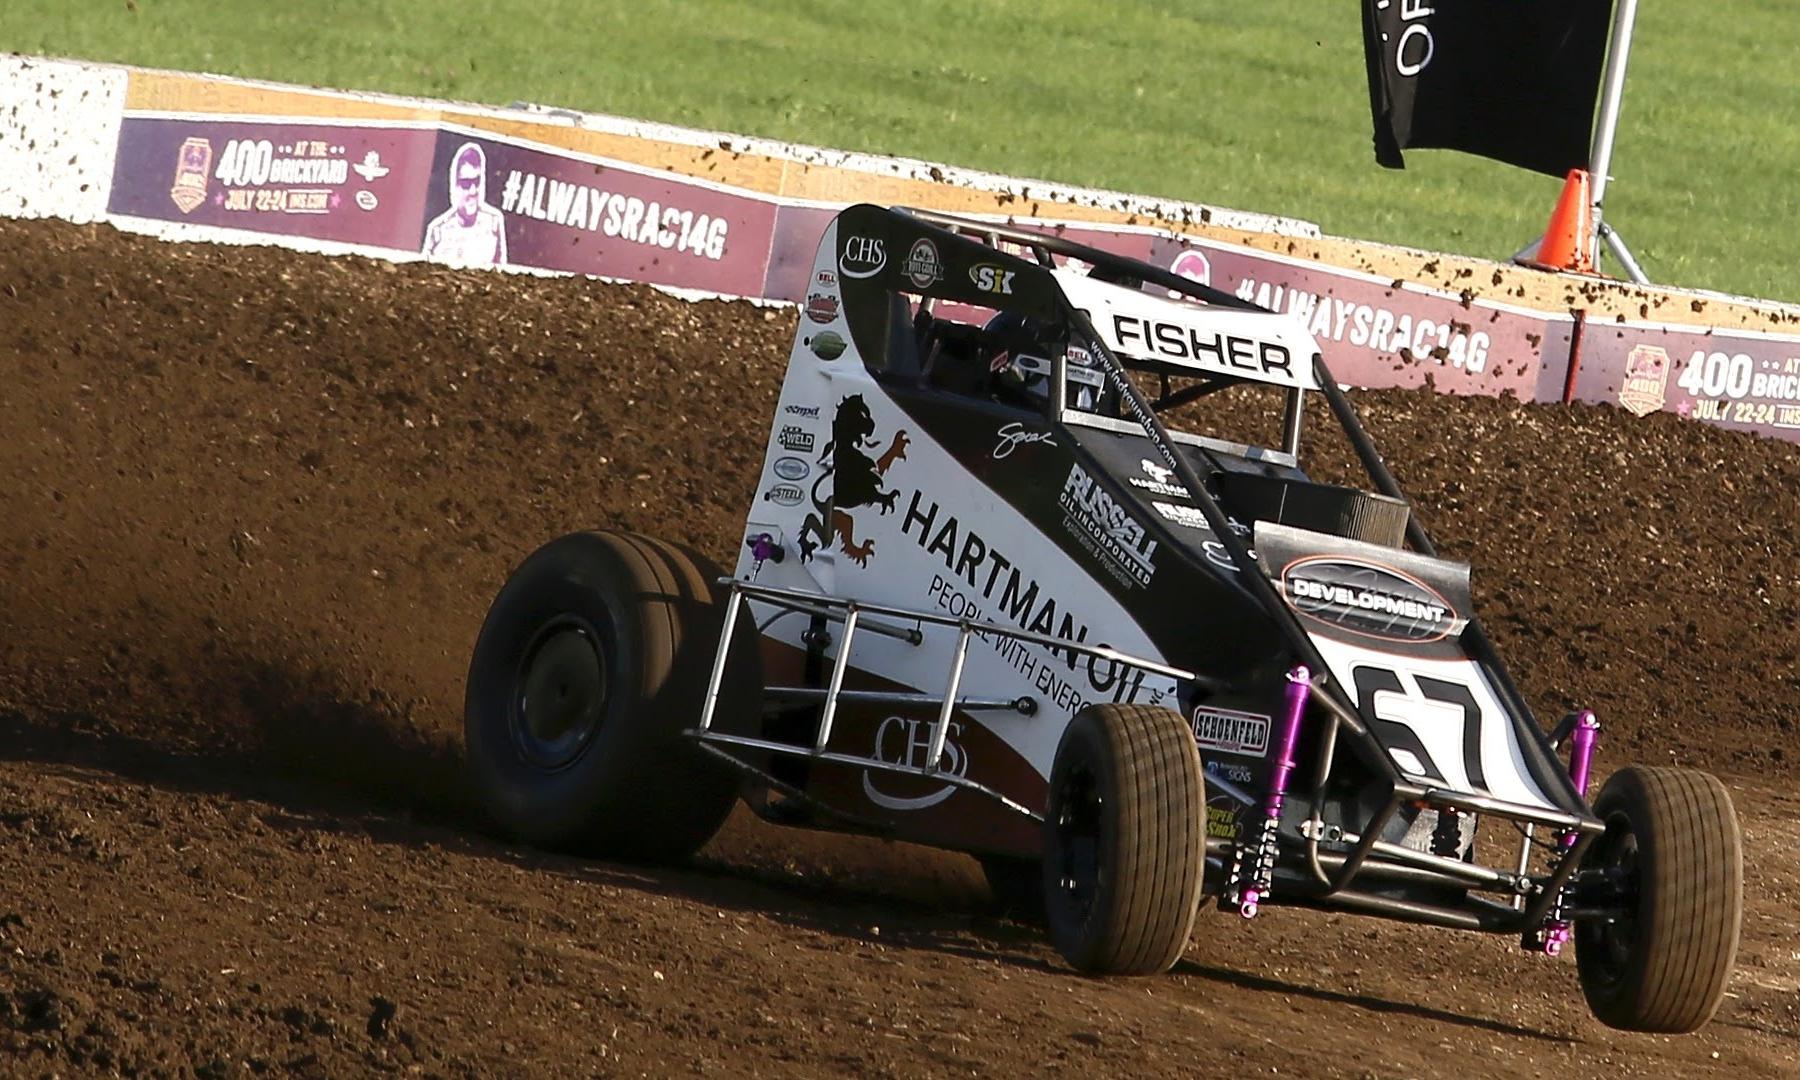 Indianapolis Motor Speedway dirt track - Sarah Fisher